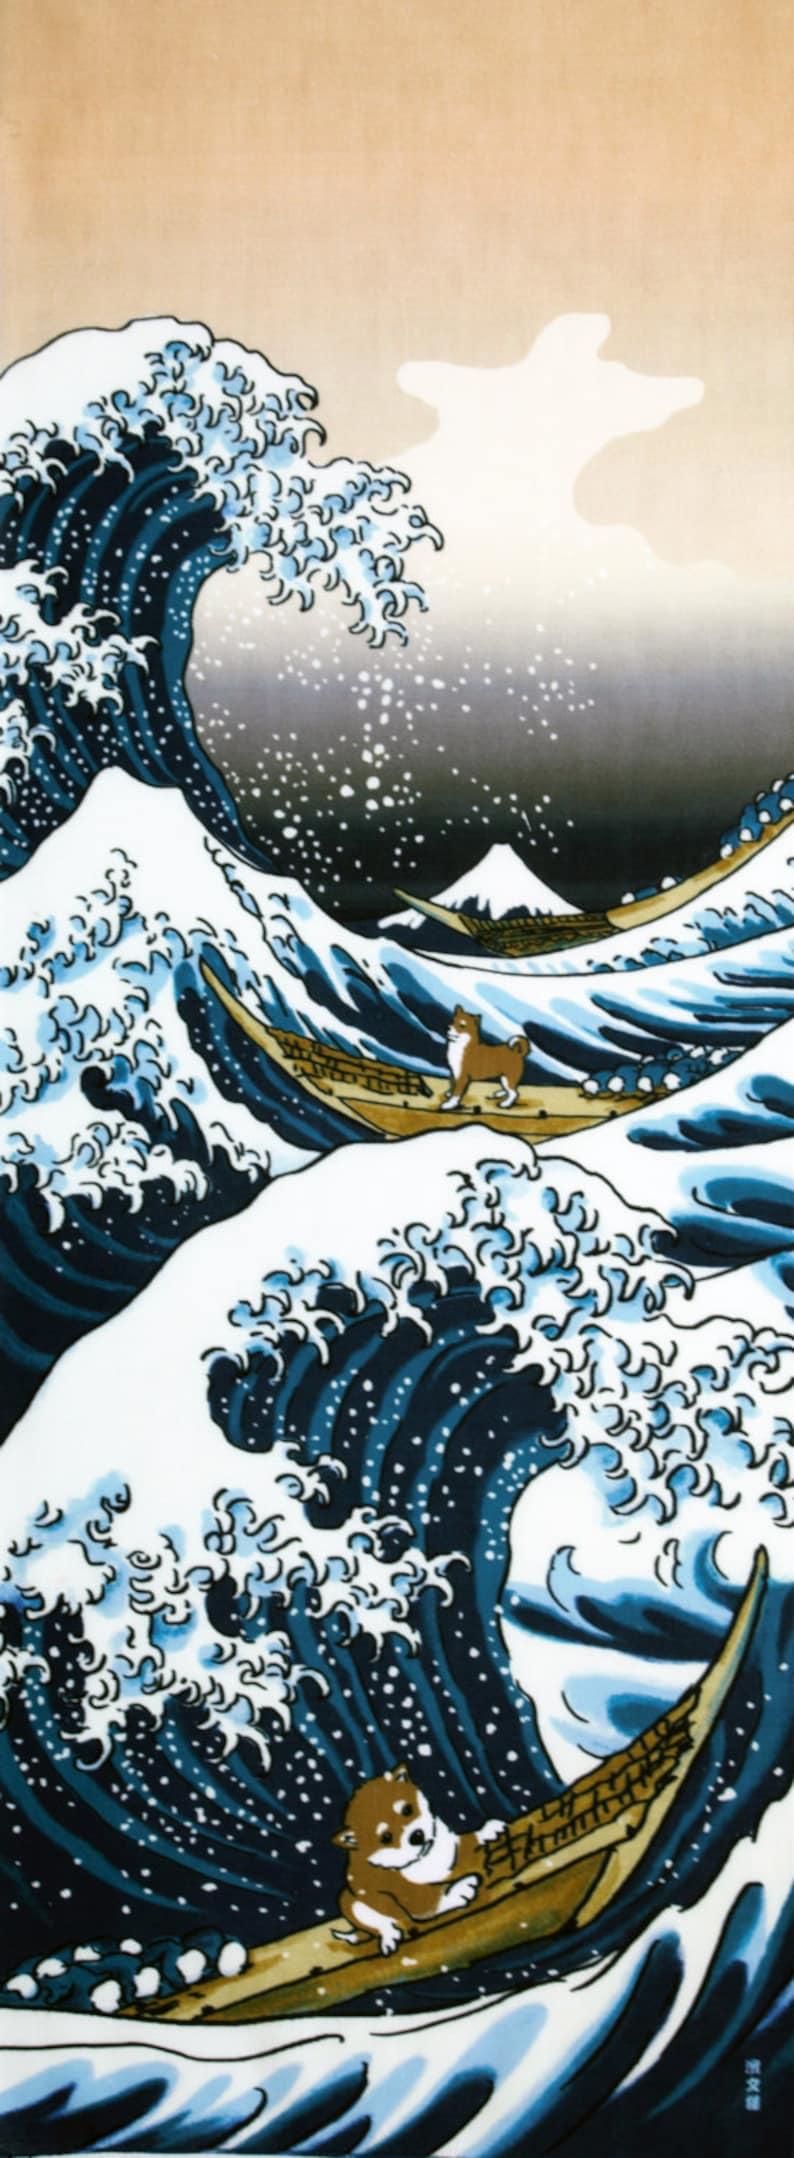 TenuguiRideau De ShibaAkita Pour Noren Murale ChienDécoration Chien Ken InuTissu Amateurs Grande VagueLes Tenugui JaponaisTsunami eoxBrdC